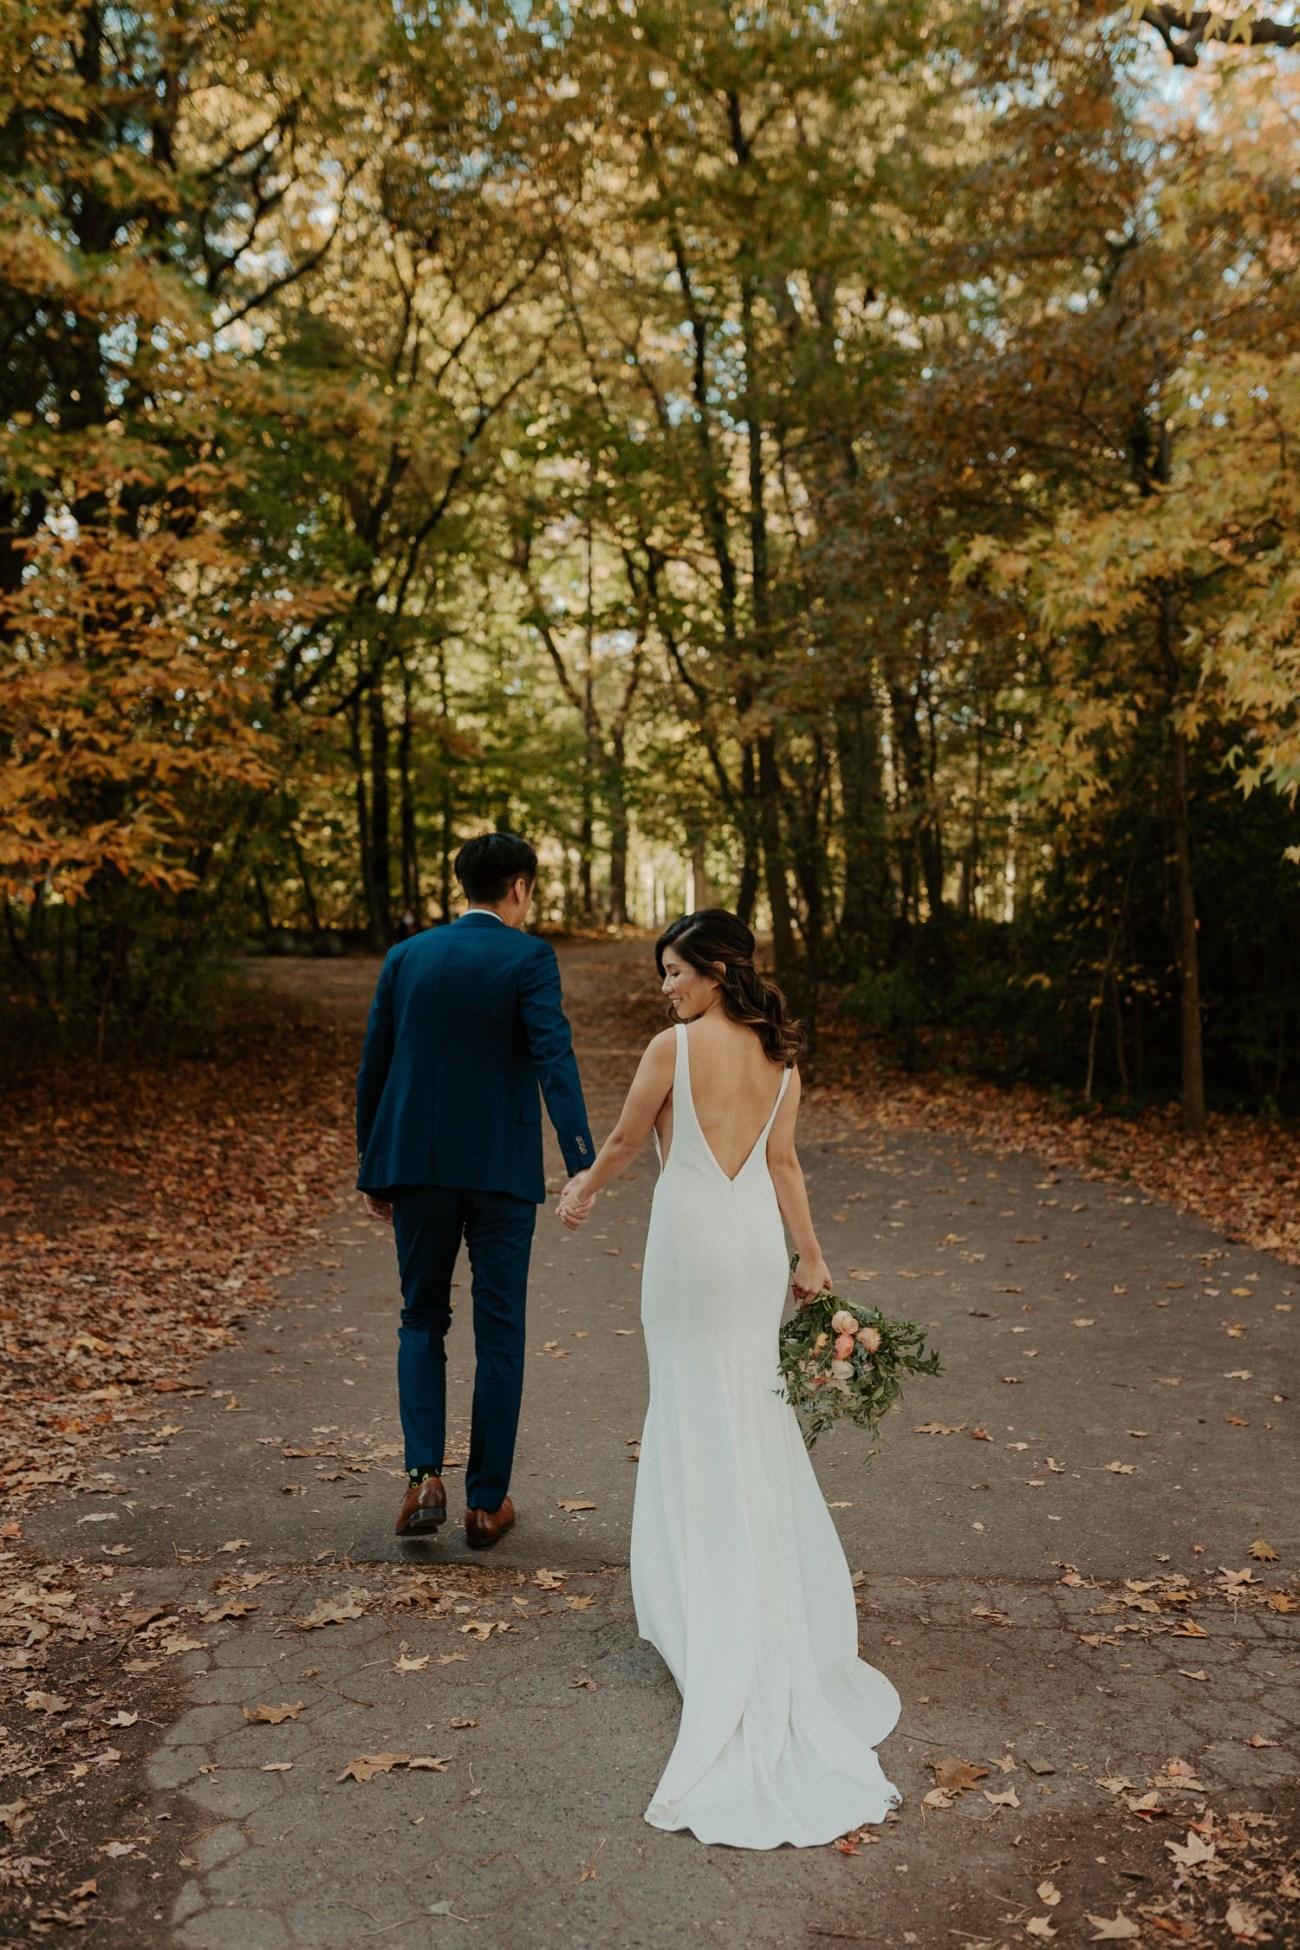 Prospect Park Brooklyn Wedding Fall Wedding In NYC New York Wedding Photographer Anais Possamai Photography 19